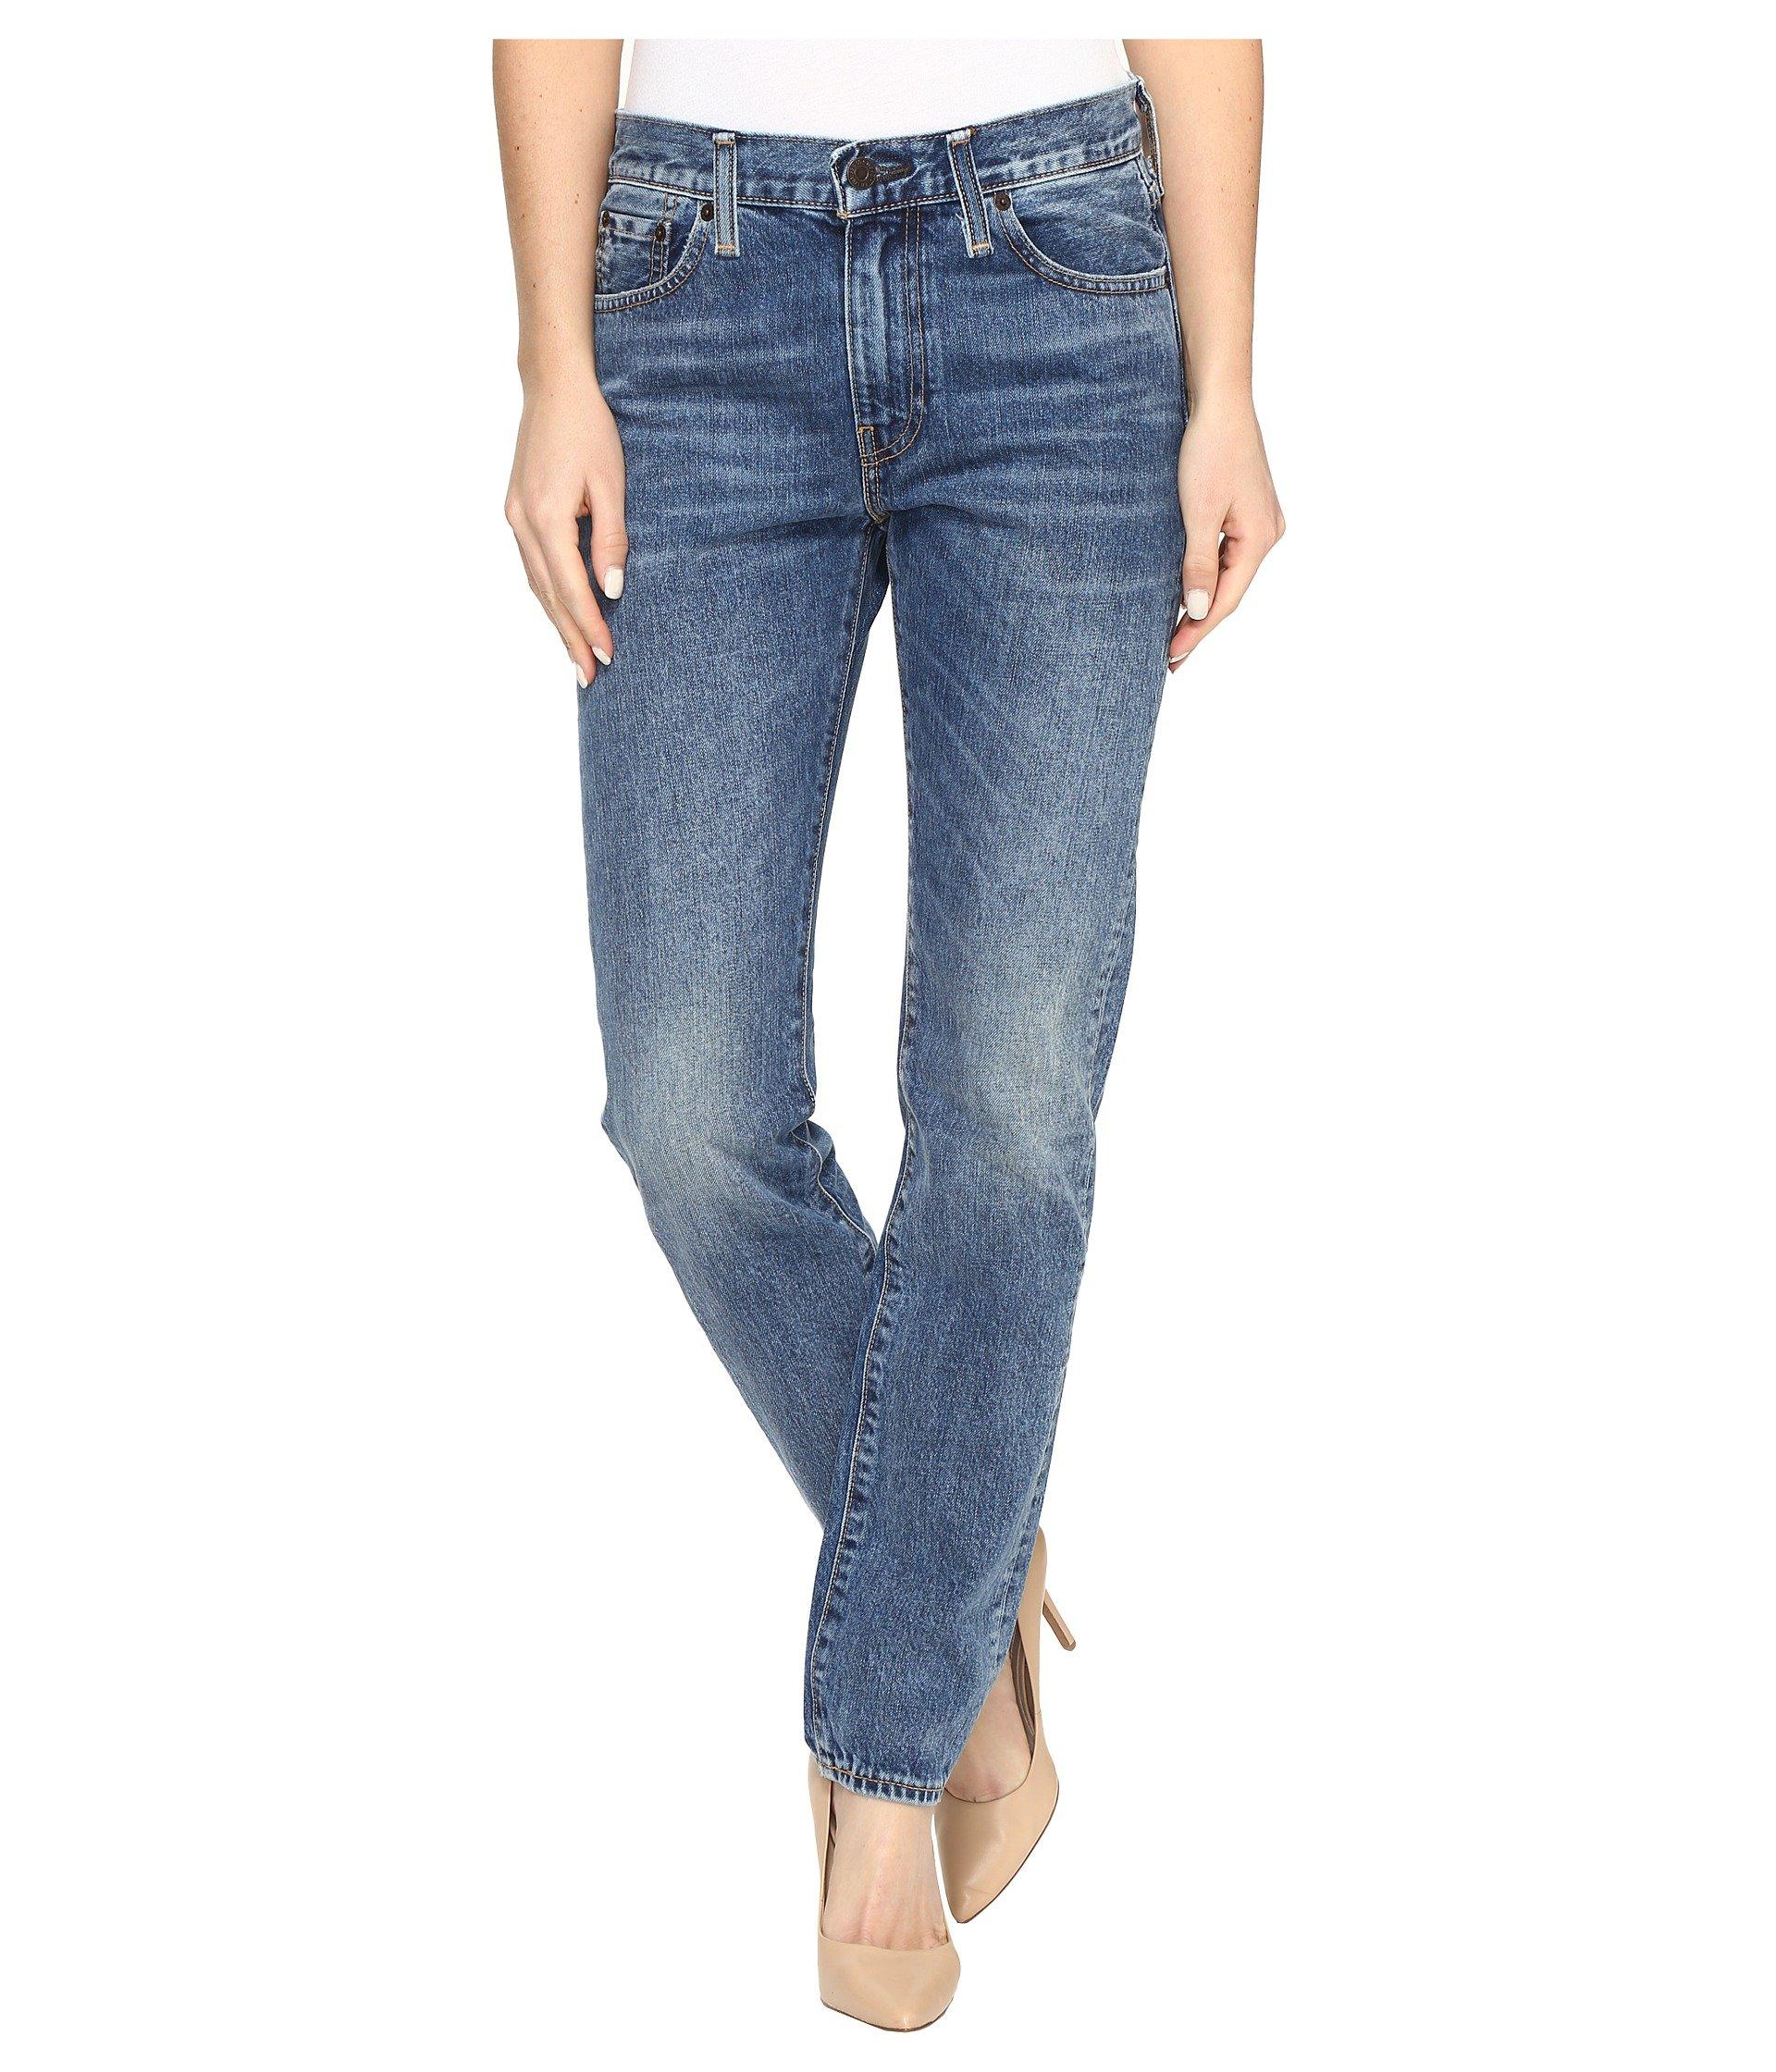 2a6807f0 Galleon - Levi's Womens Women's Premium 505C Jeans Heart Of Indigo Jeans